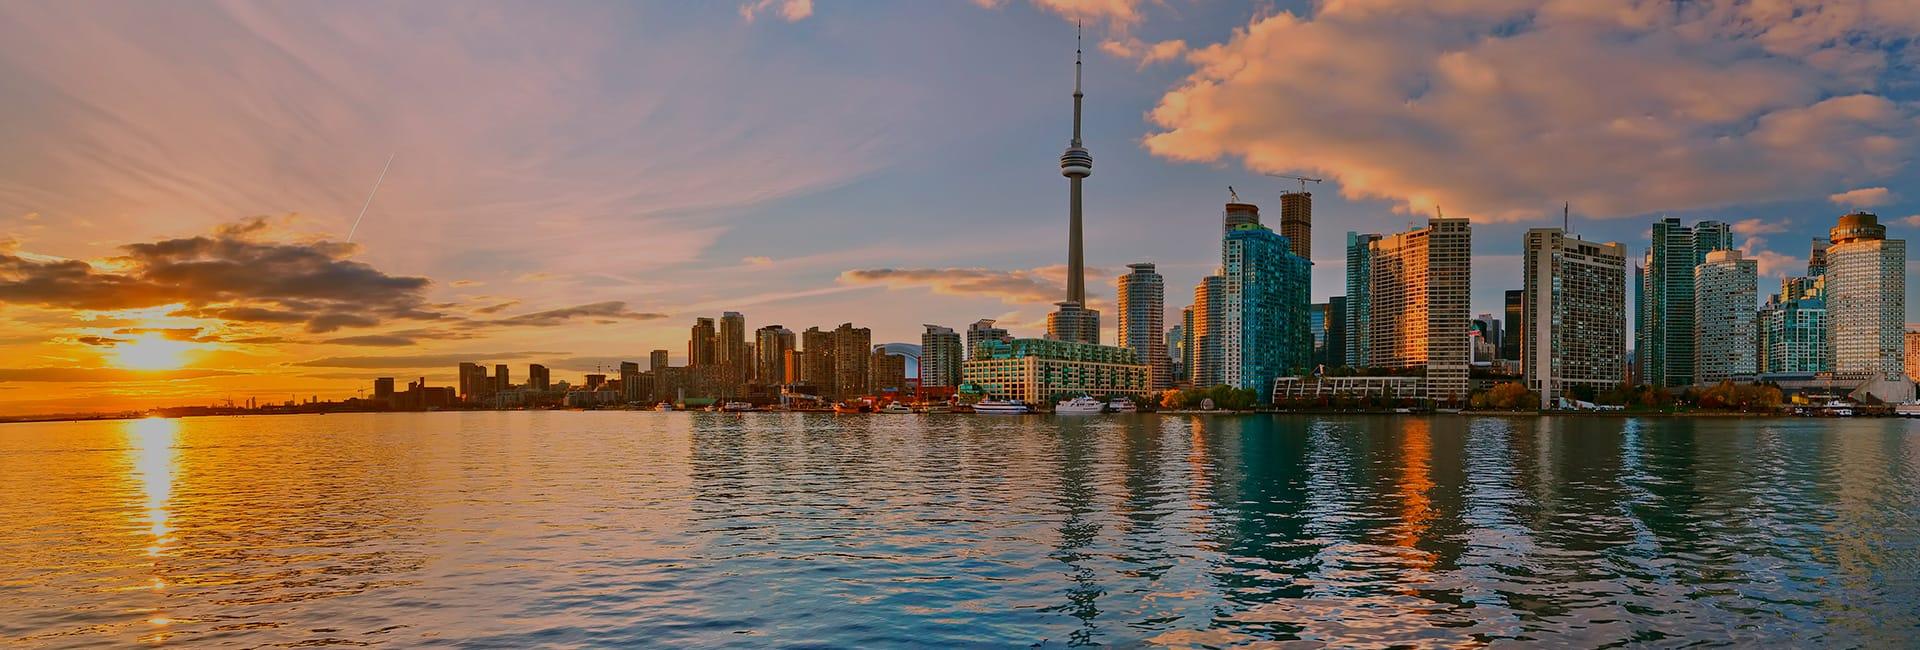 Toronto Island Canadá